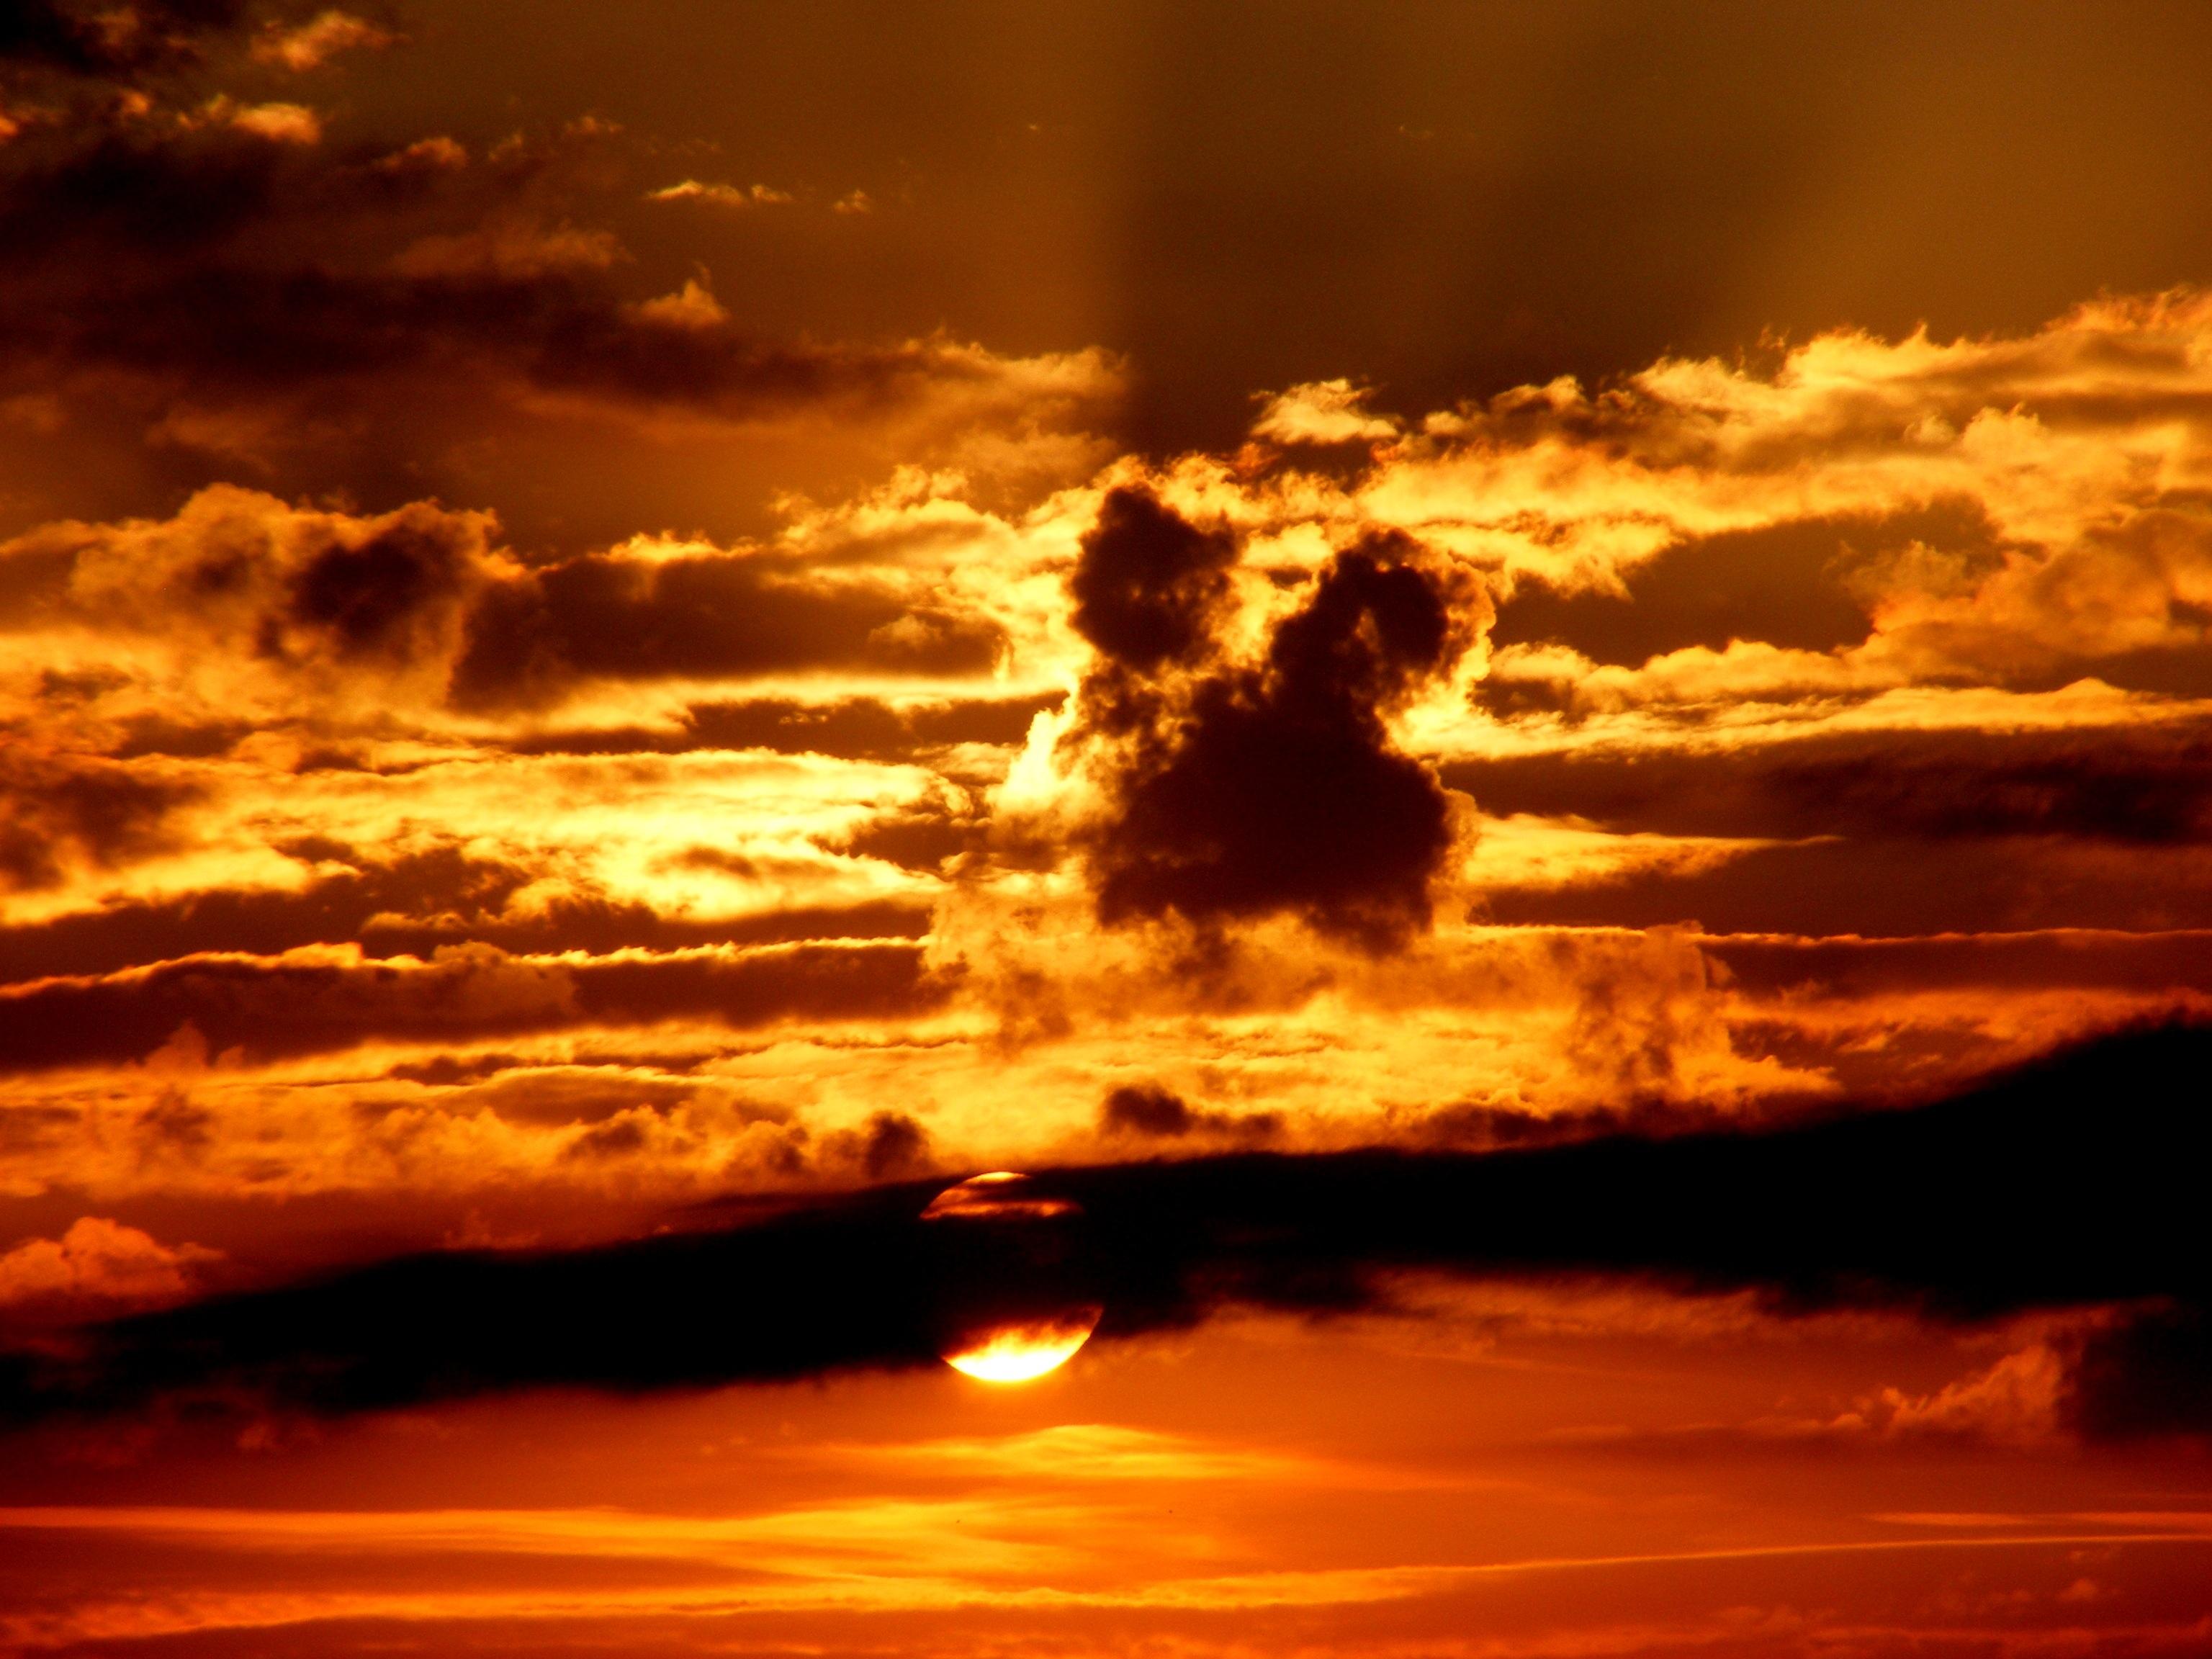 Sunset, gold, orange, sun, sunlight, evening